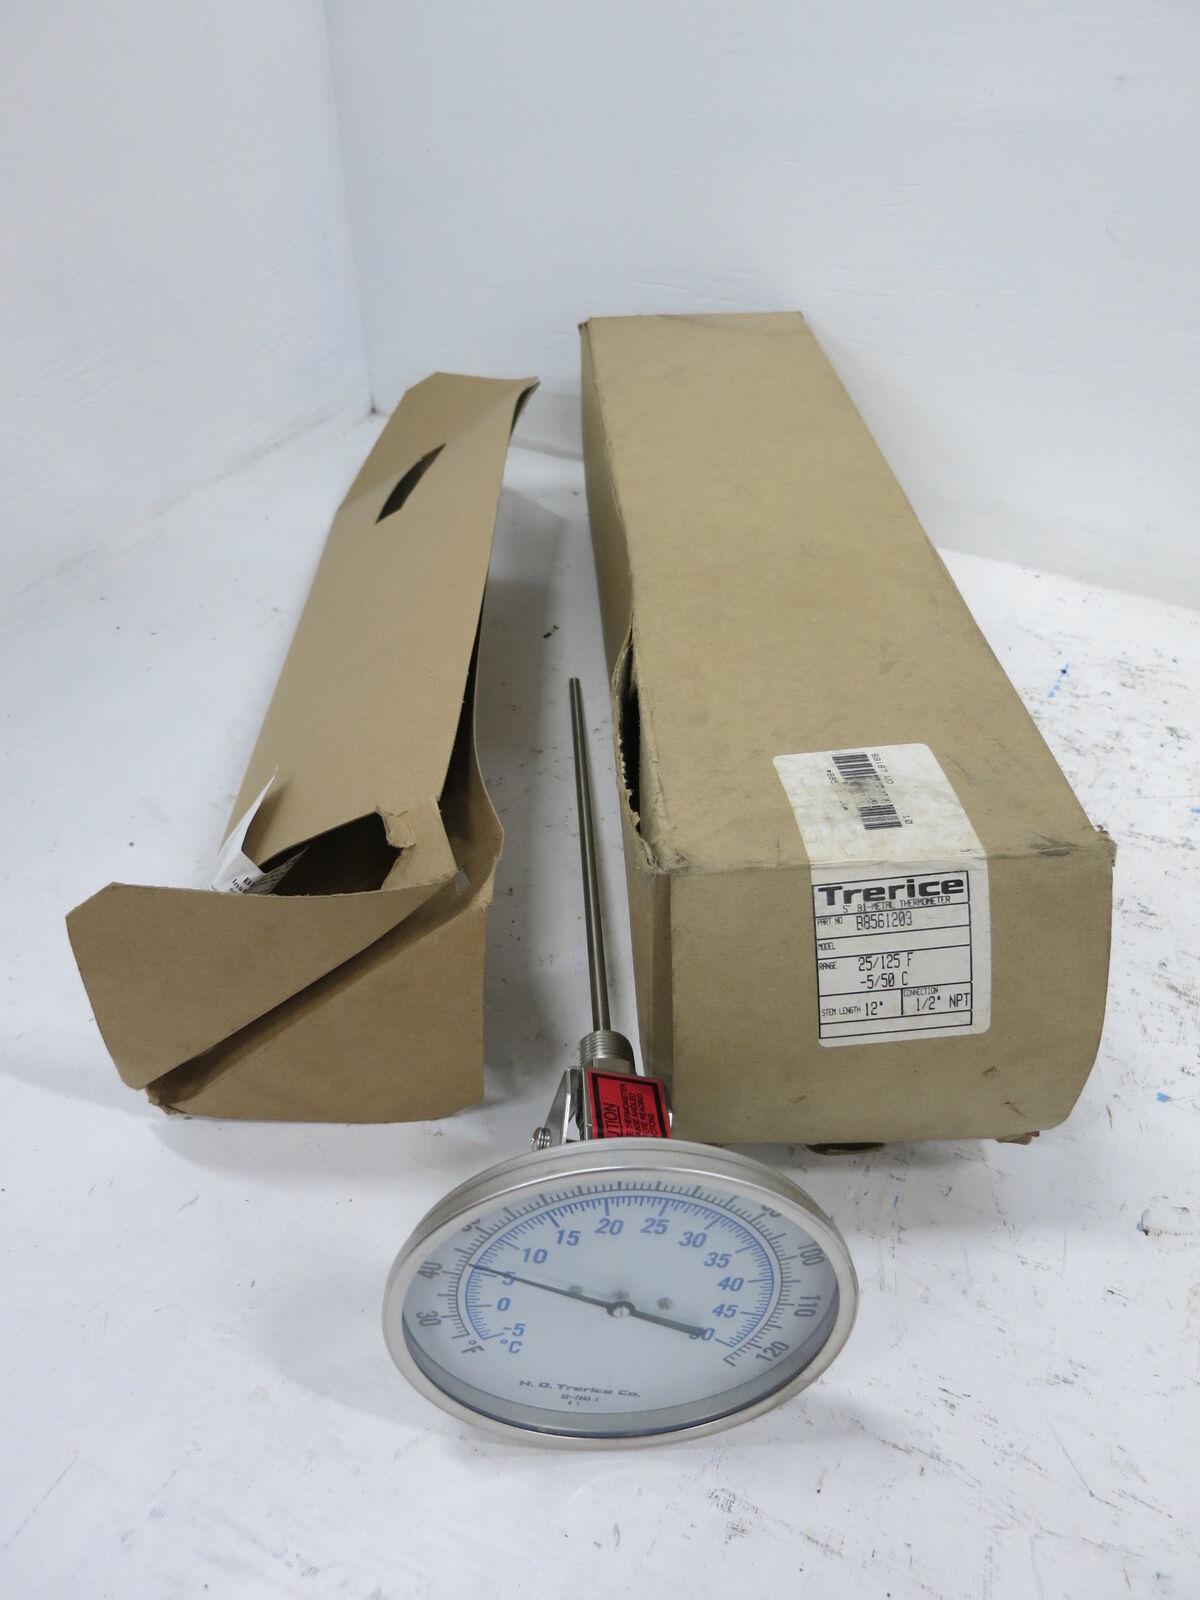 NEW Trerice B8561203 Thermometer 25 125 F -5 50 C 5  Bi-Metal 12  Stem 1 2  NPT